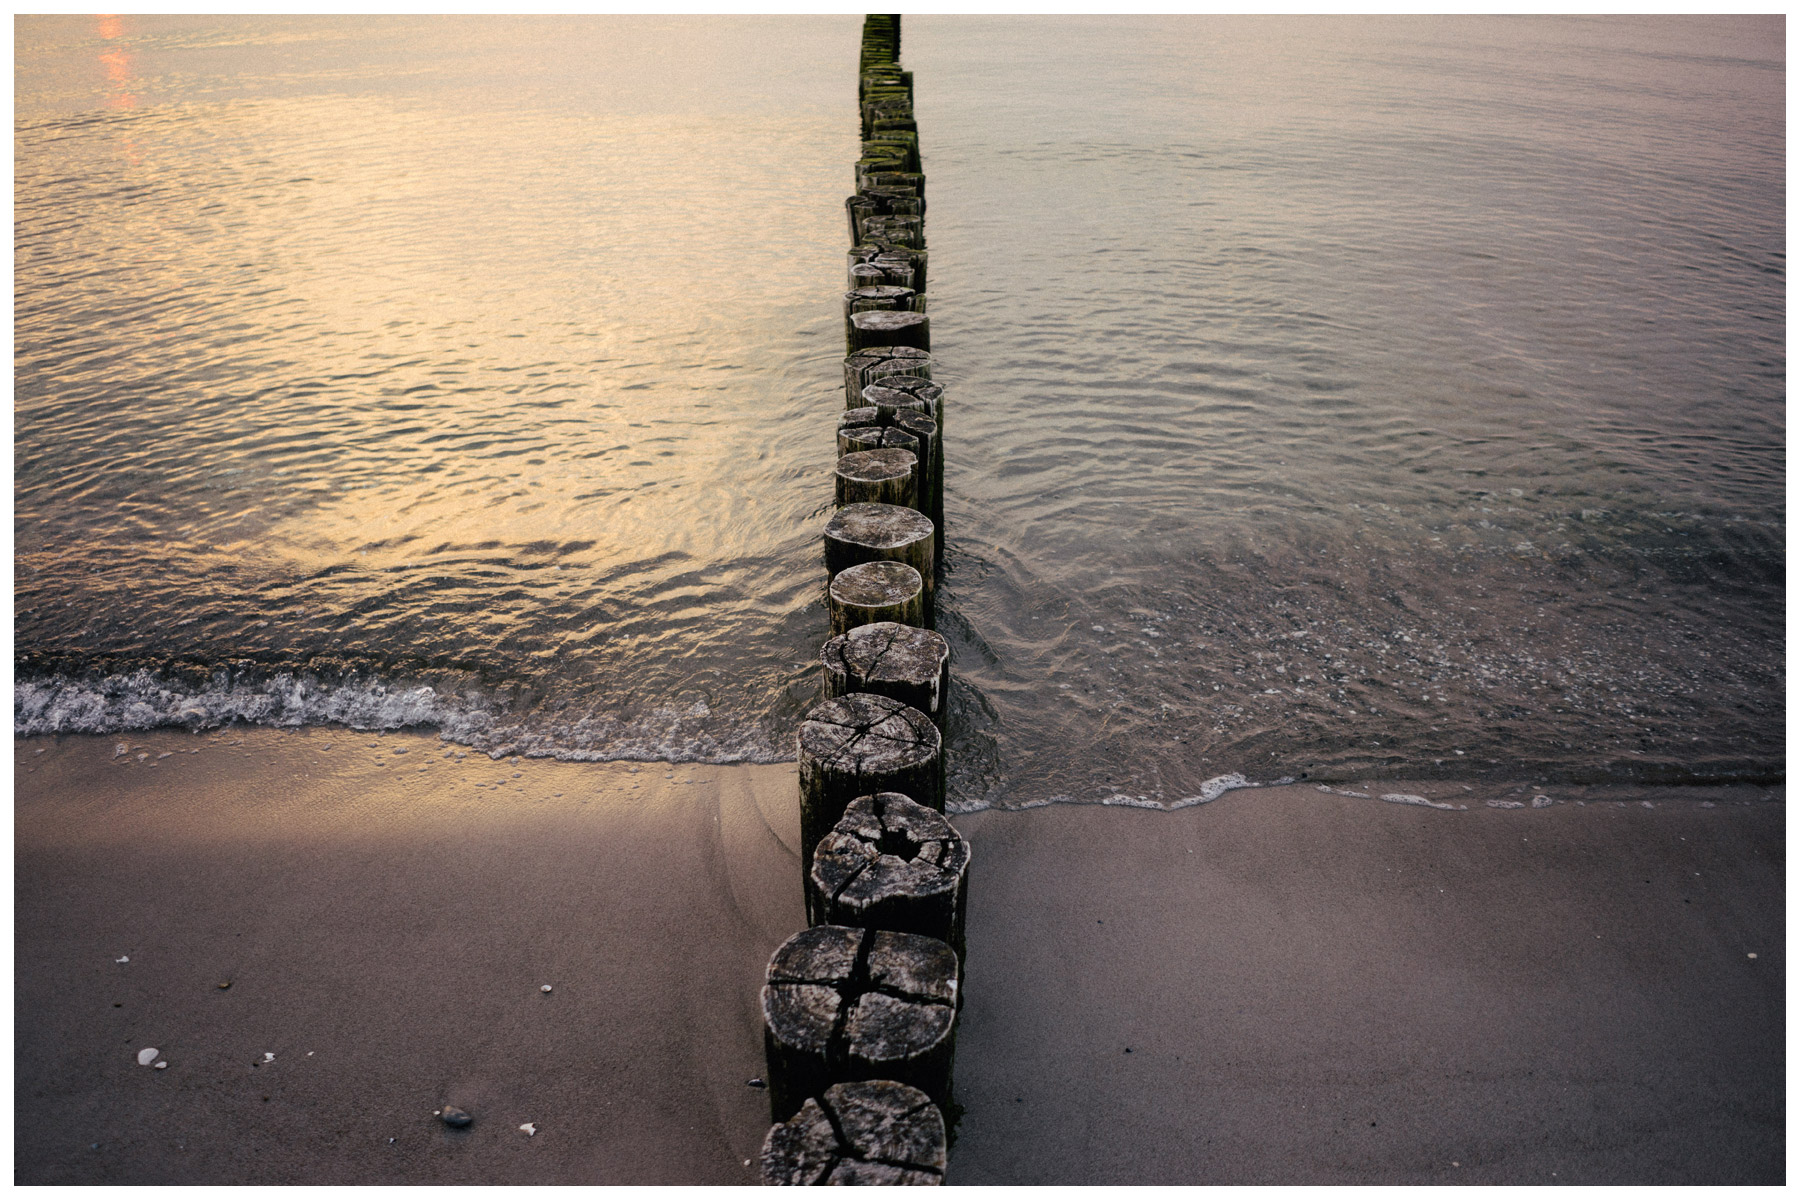 reise-blog-ostsee-warnemünde-travel-ohhedwig-11